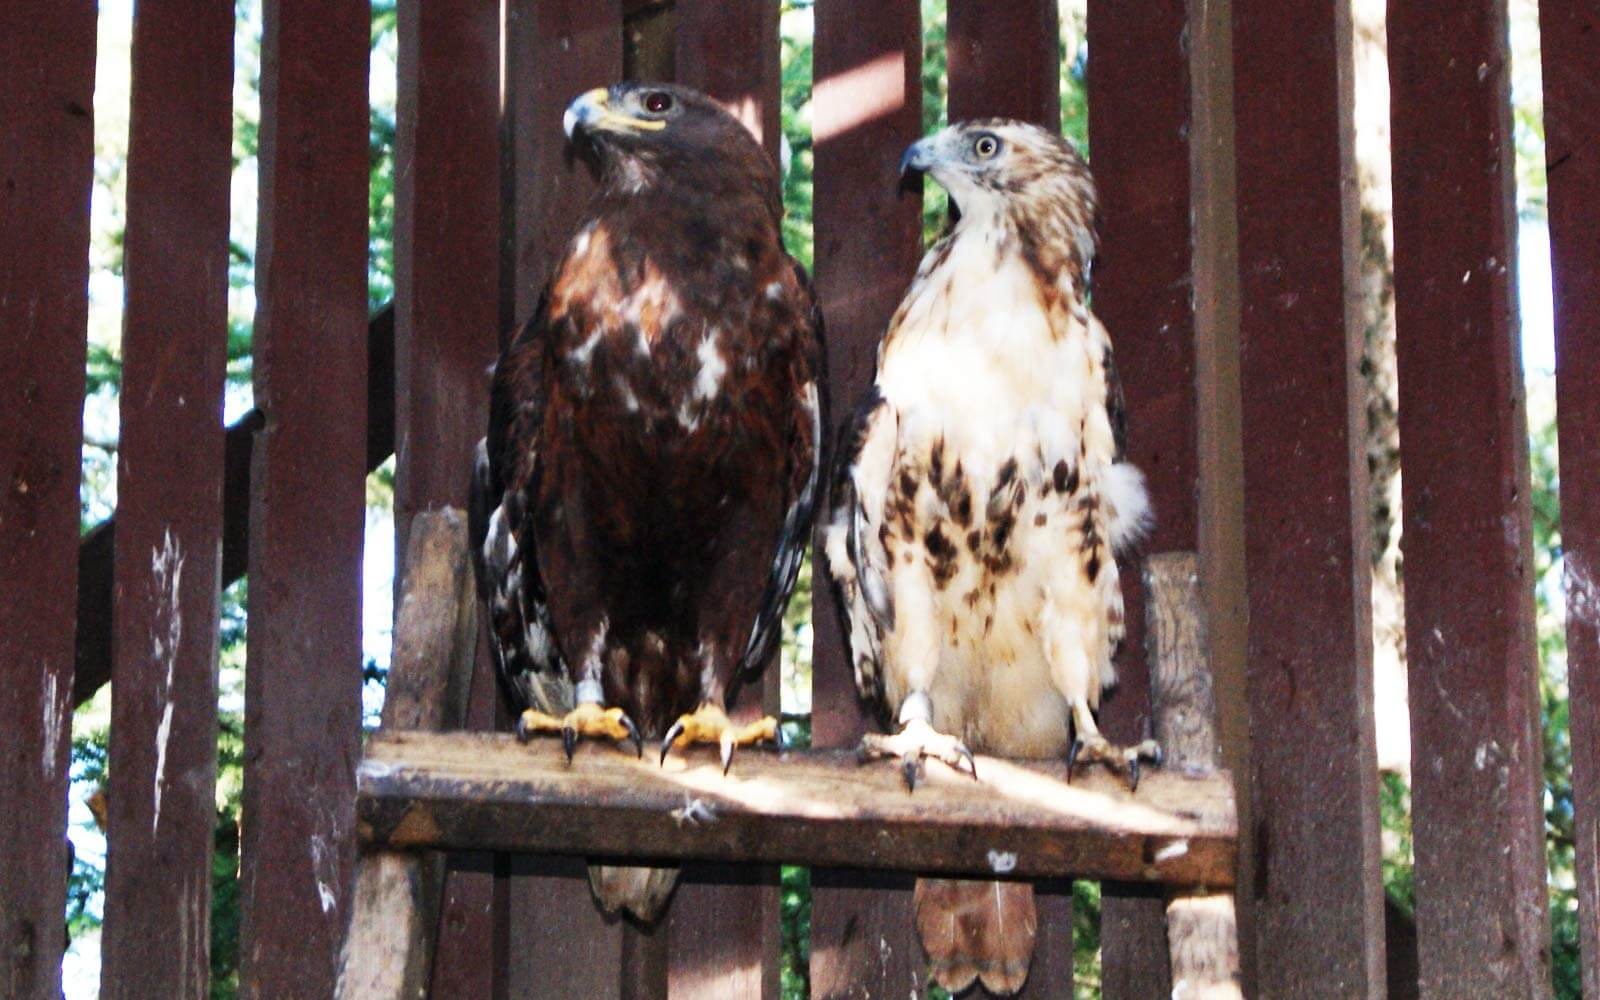 Zwei Greifvögel